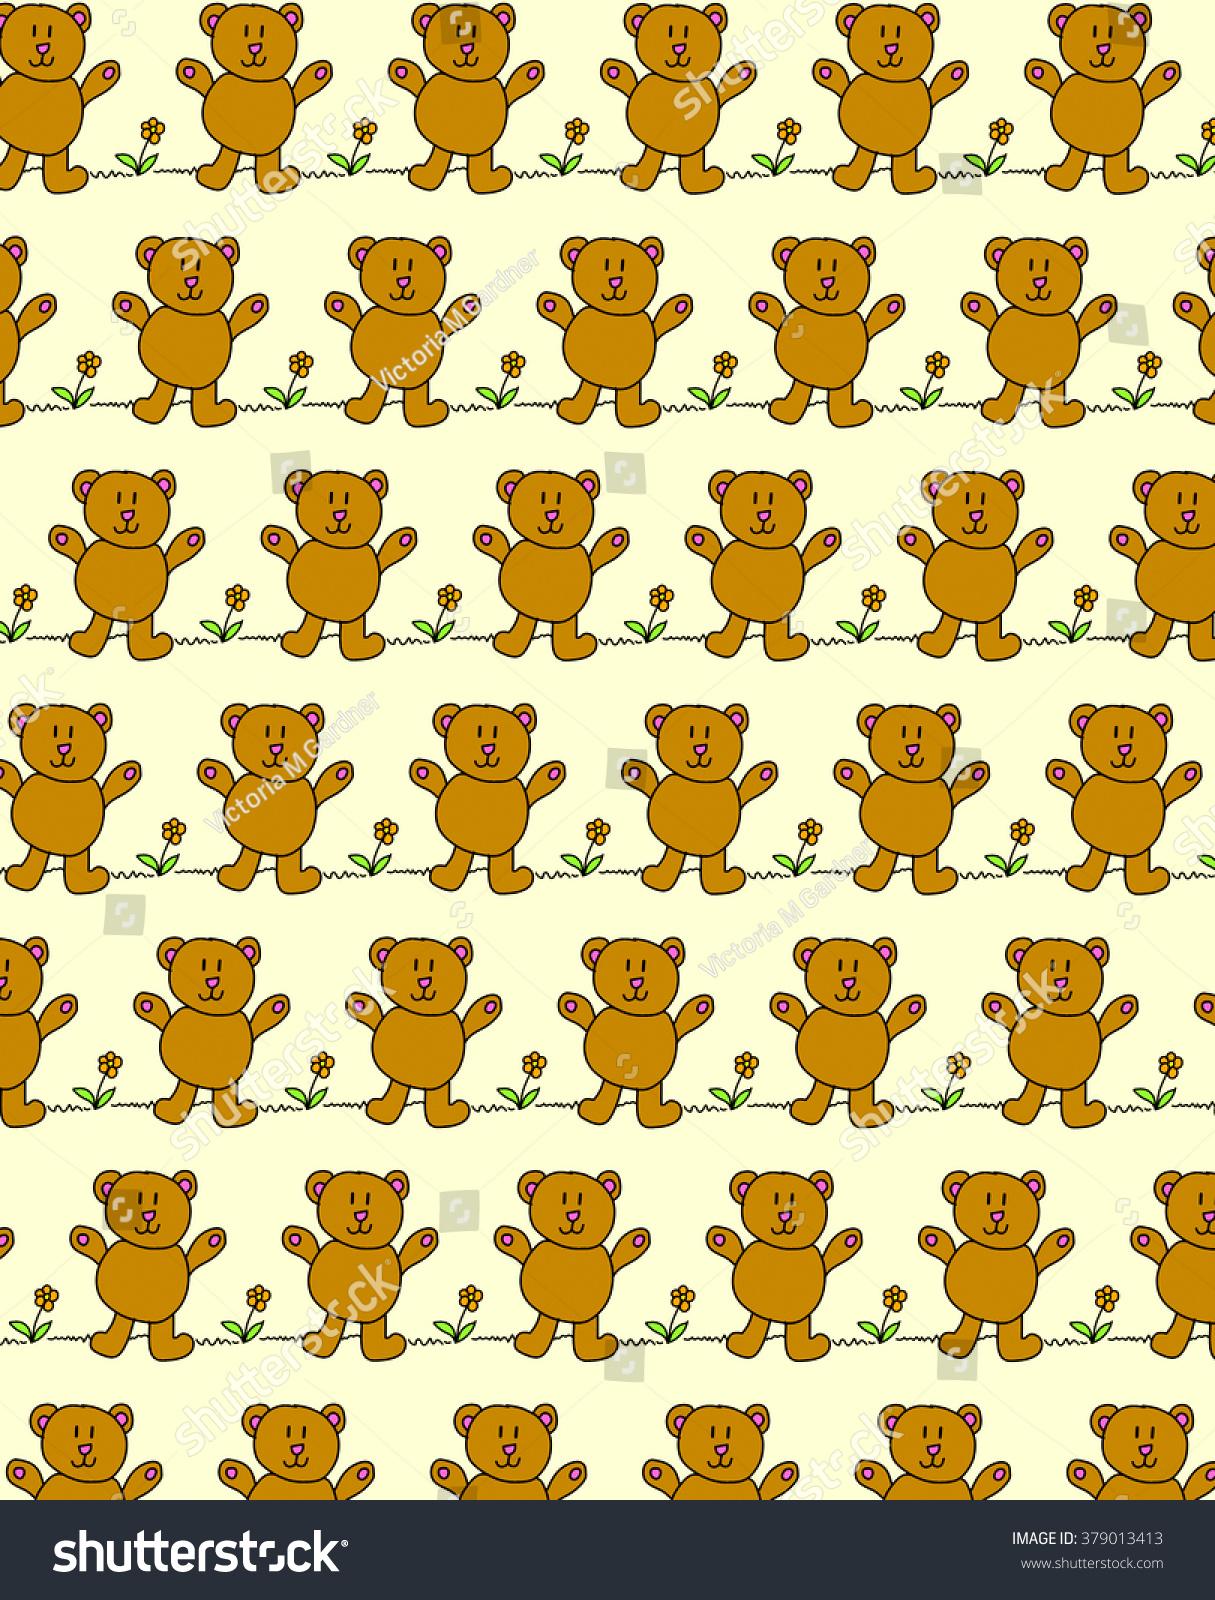 Illustration Repetitive Teddy Bear Design Wallpaper Stock